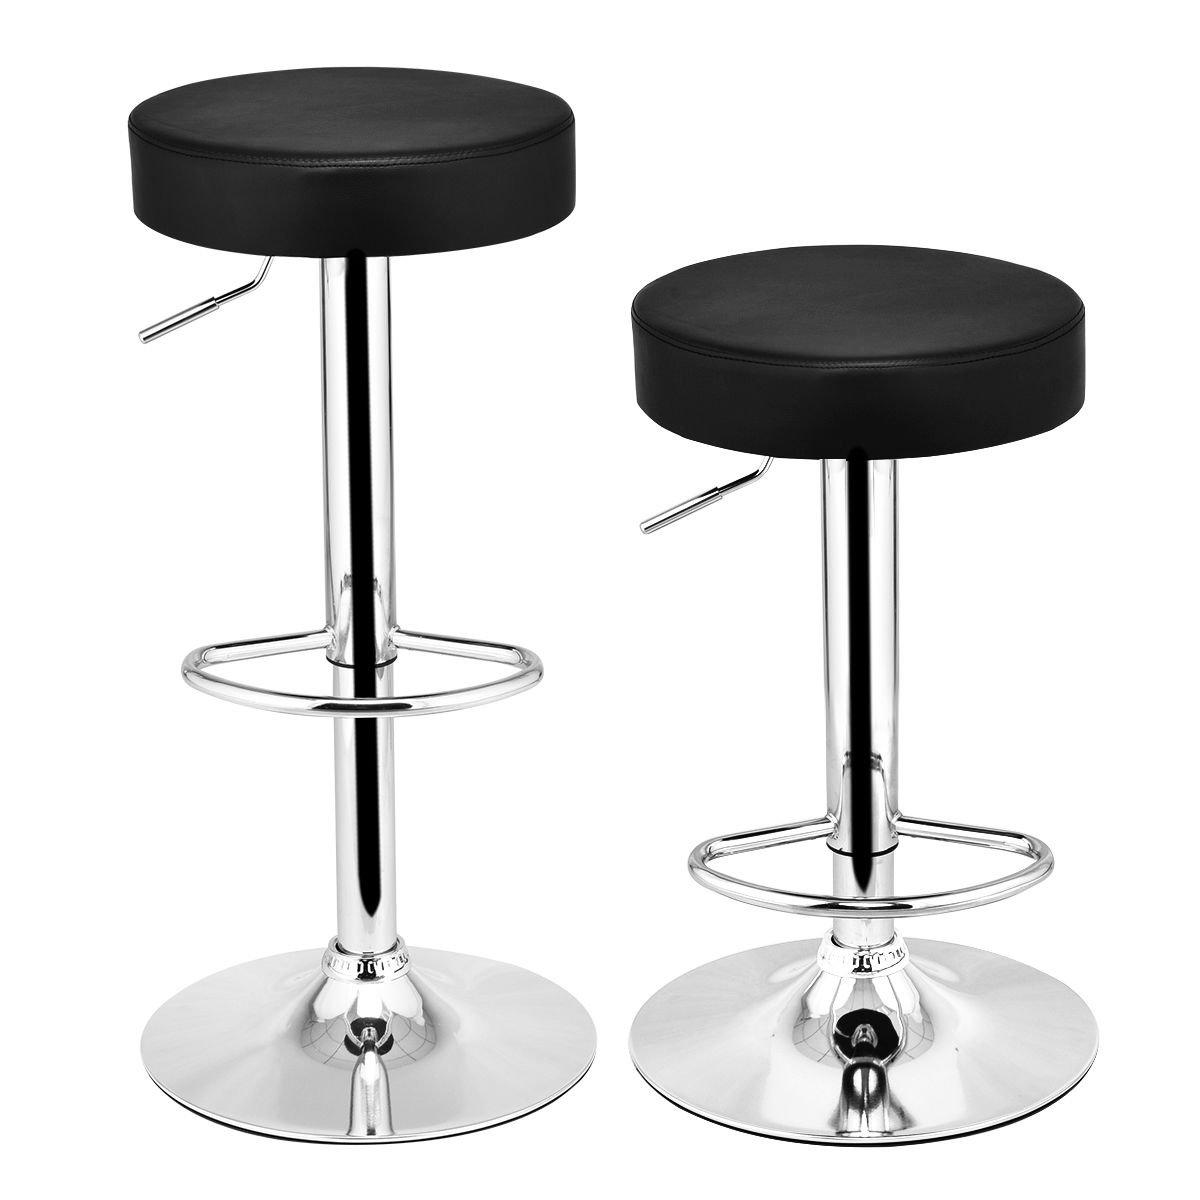 COSTWAY Swivel Bar Stool Round PU Leather Height Adjustable Chair Pub Stool w/Chrome Footrest (Black, 2 pcs)